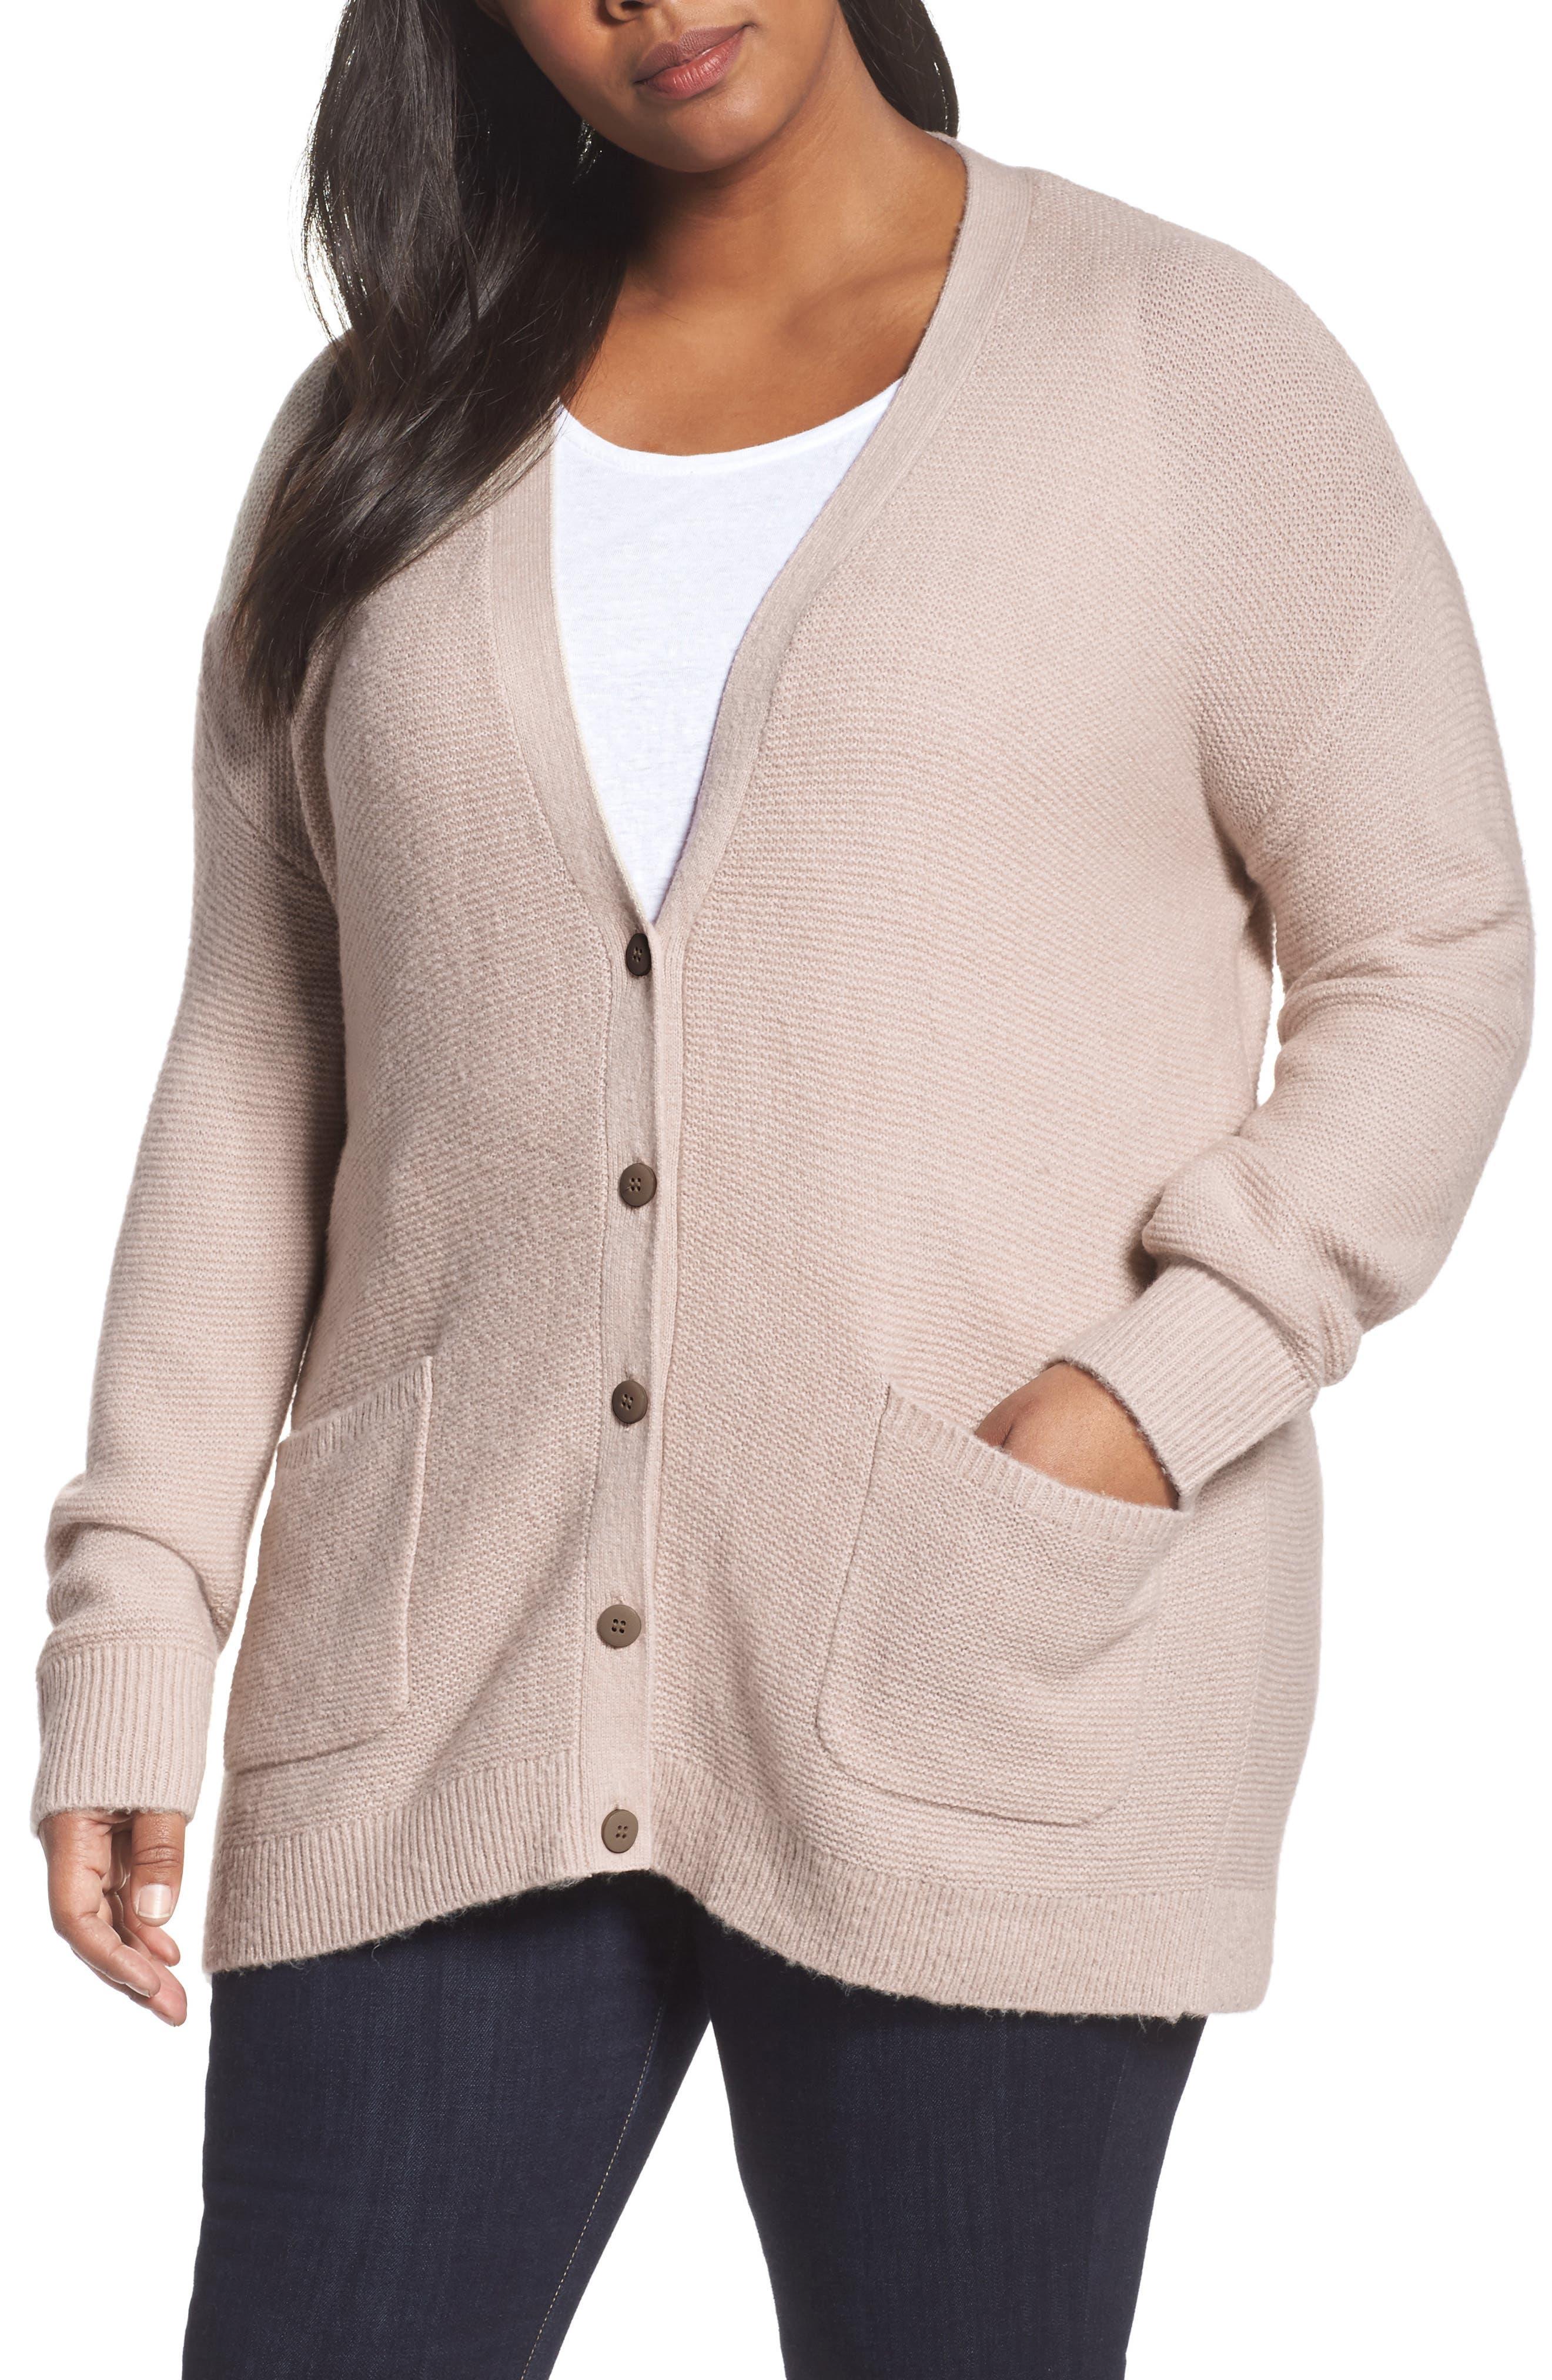 Alternate Image 1 Selected - Caslon® Long V-Neck Wool Blend Cardigan (Plus Size)